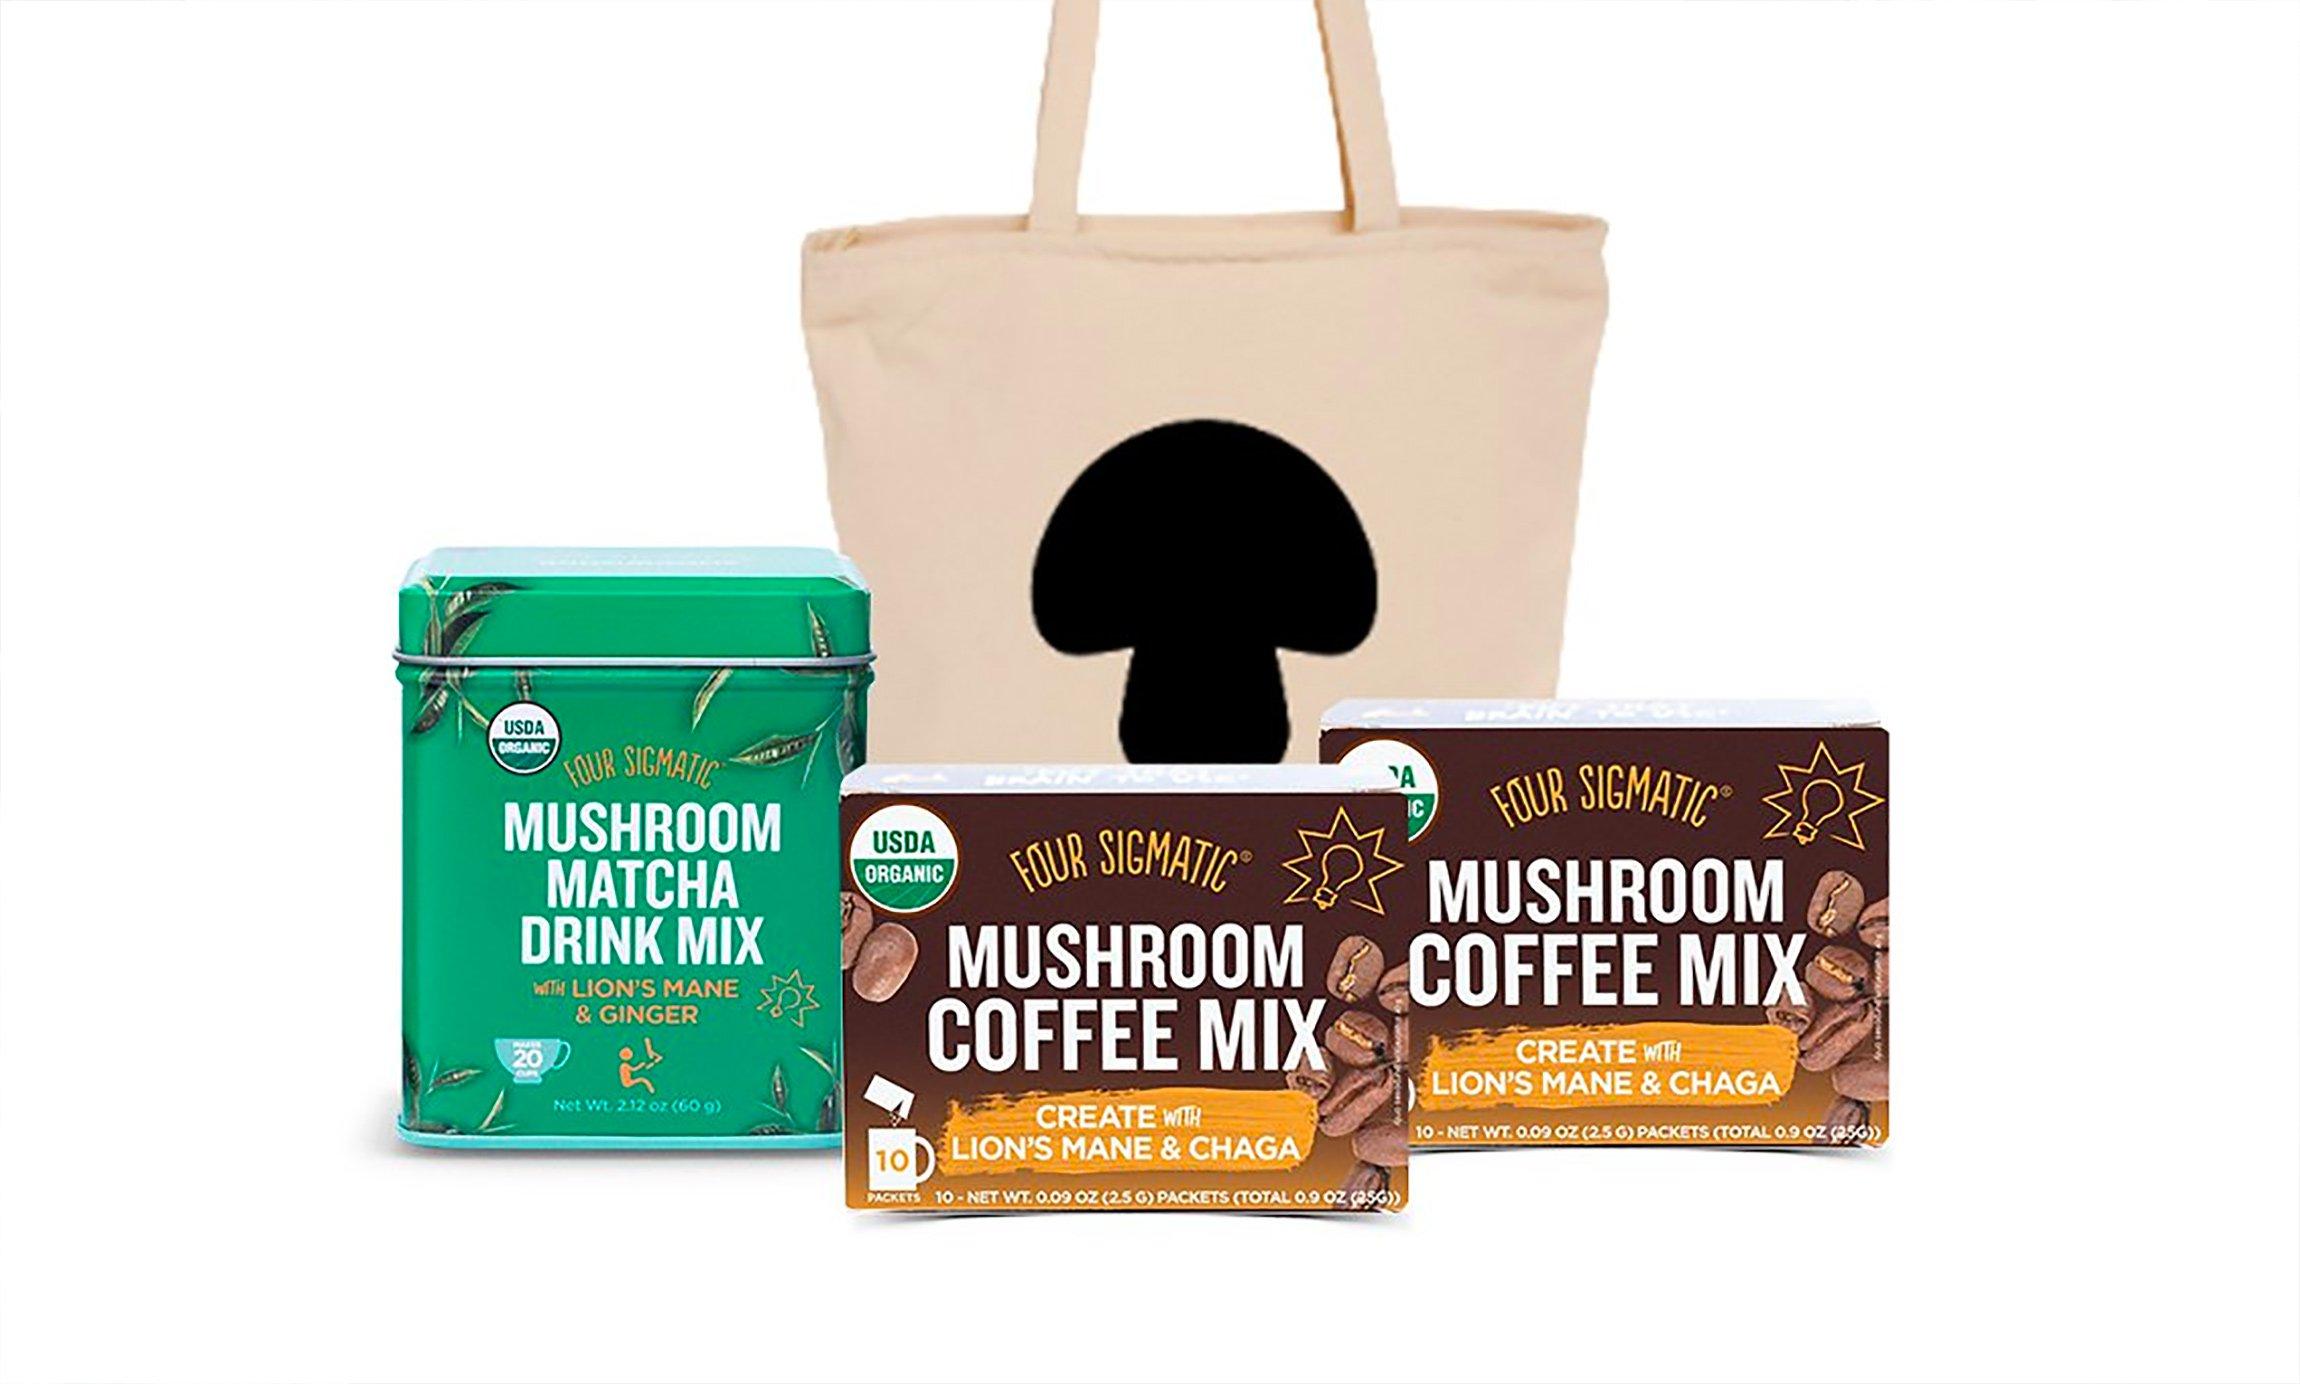 Mushroom drink mixes